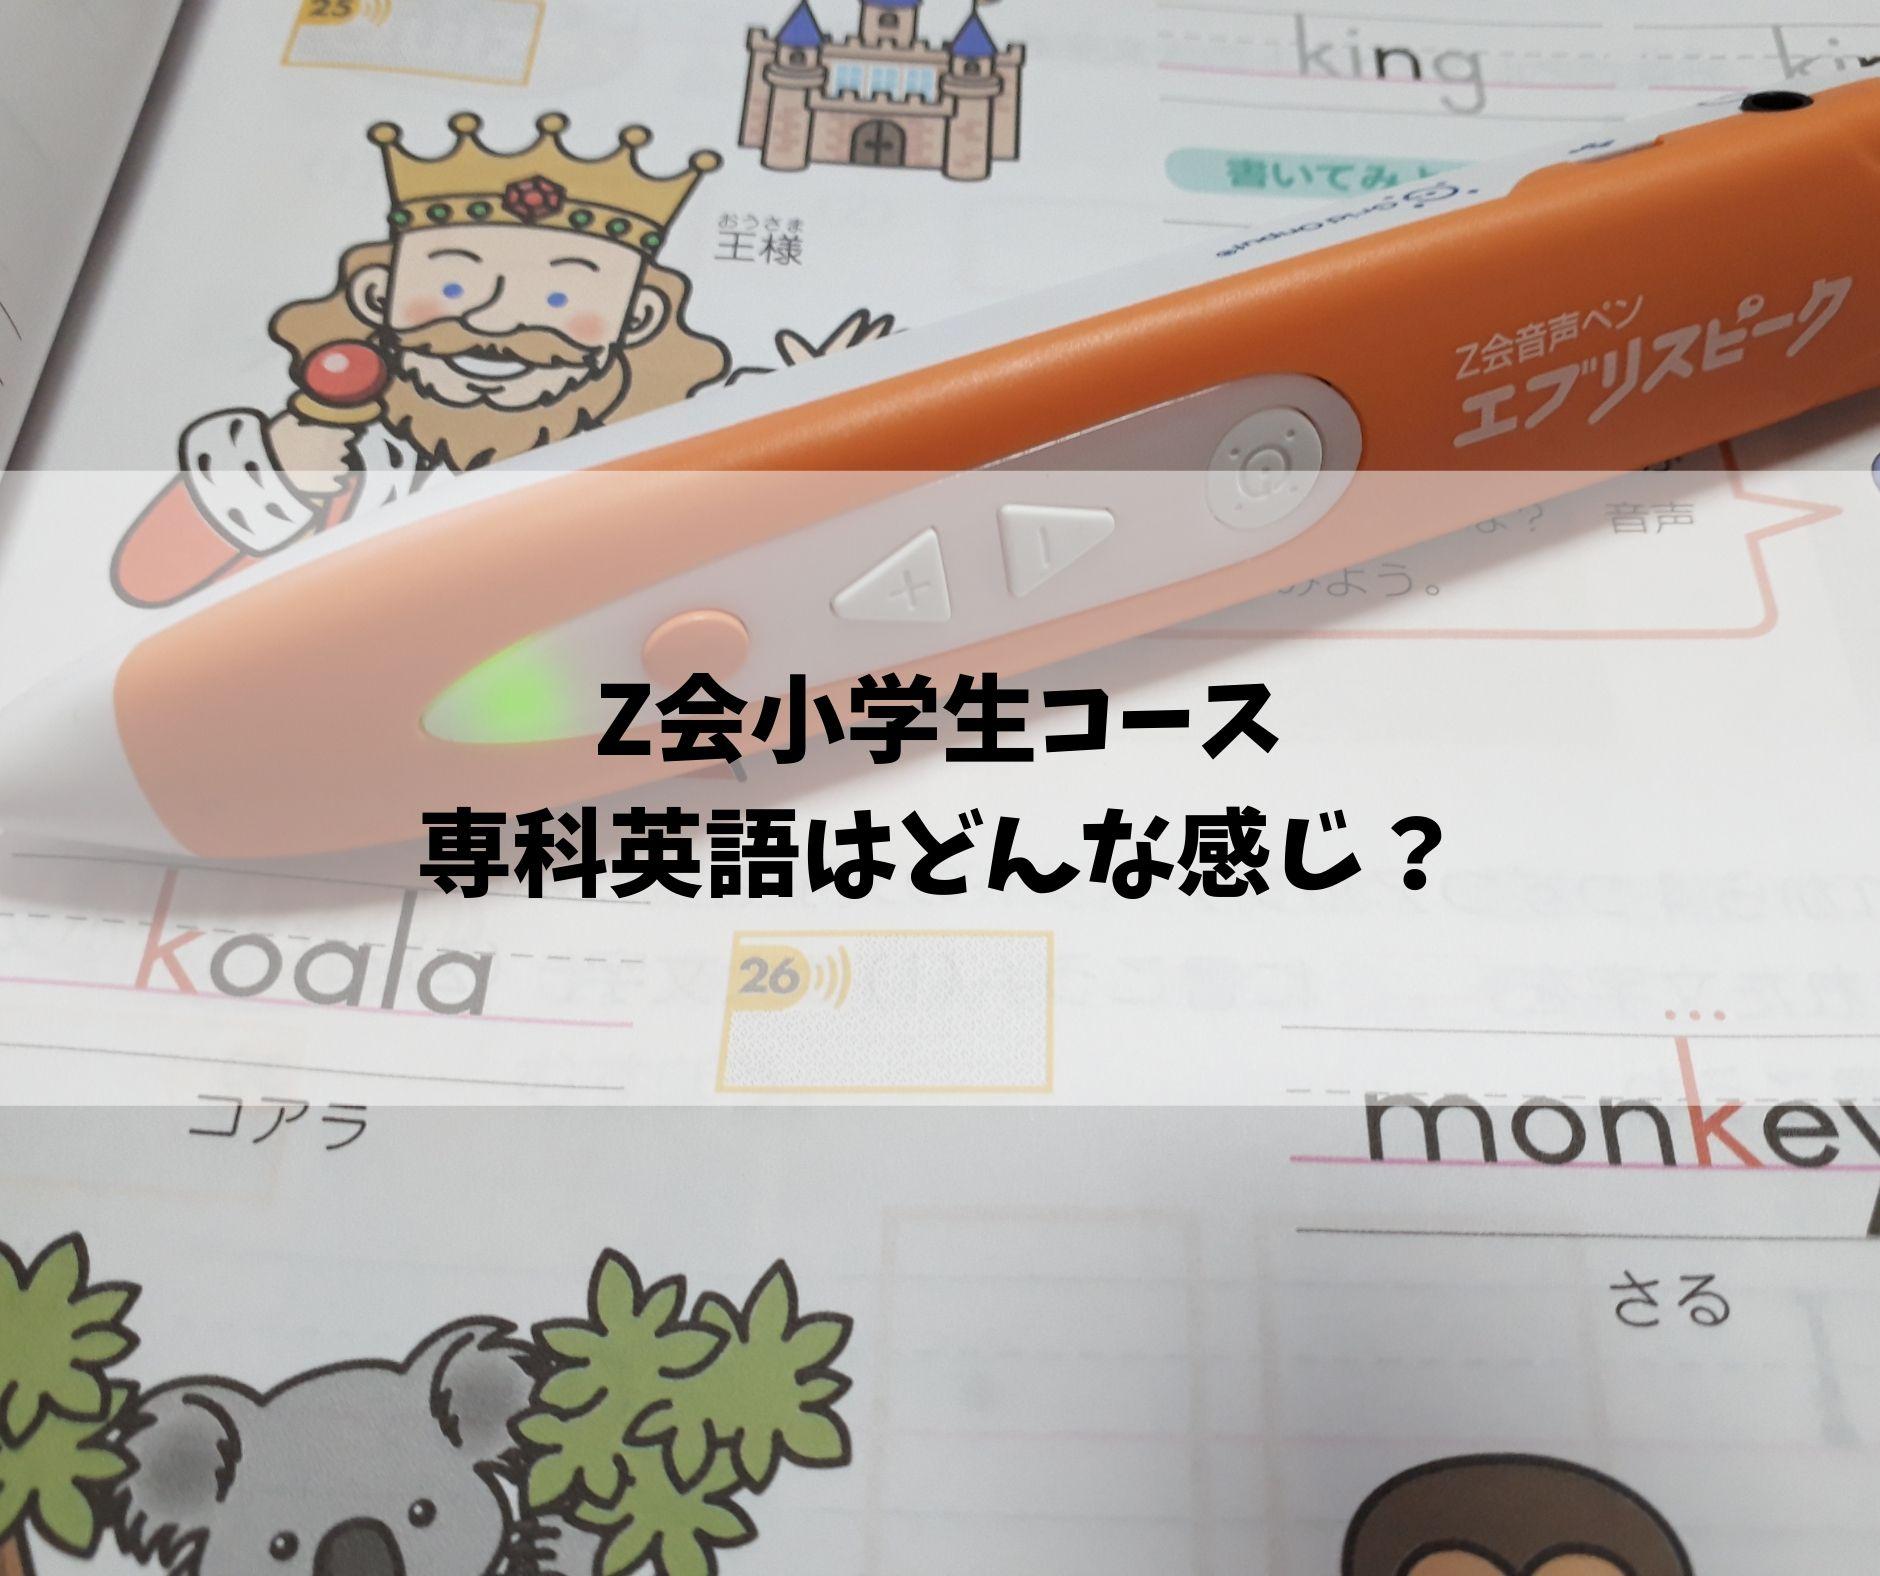 Z会小学生コースの専科英語はどんな感じ?他サービス経験済みの娘の体験談